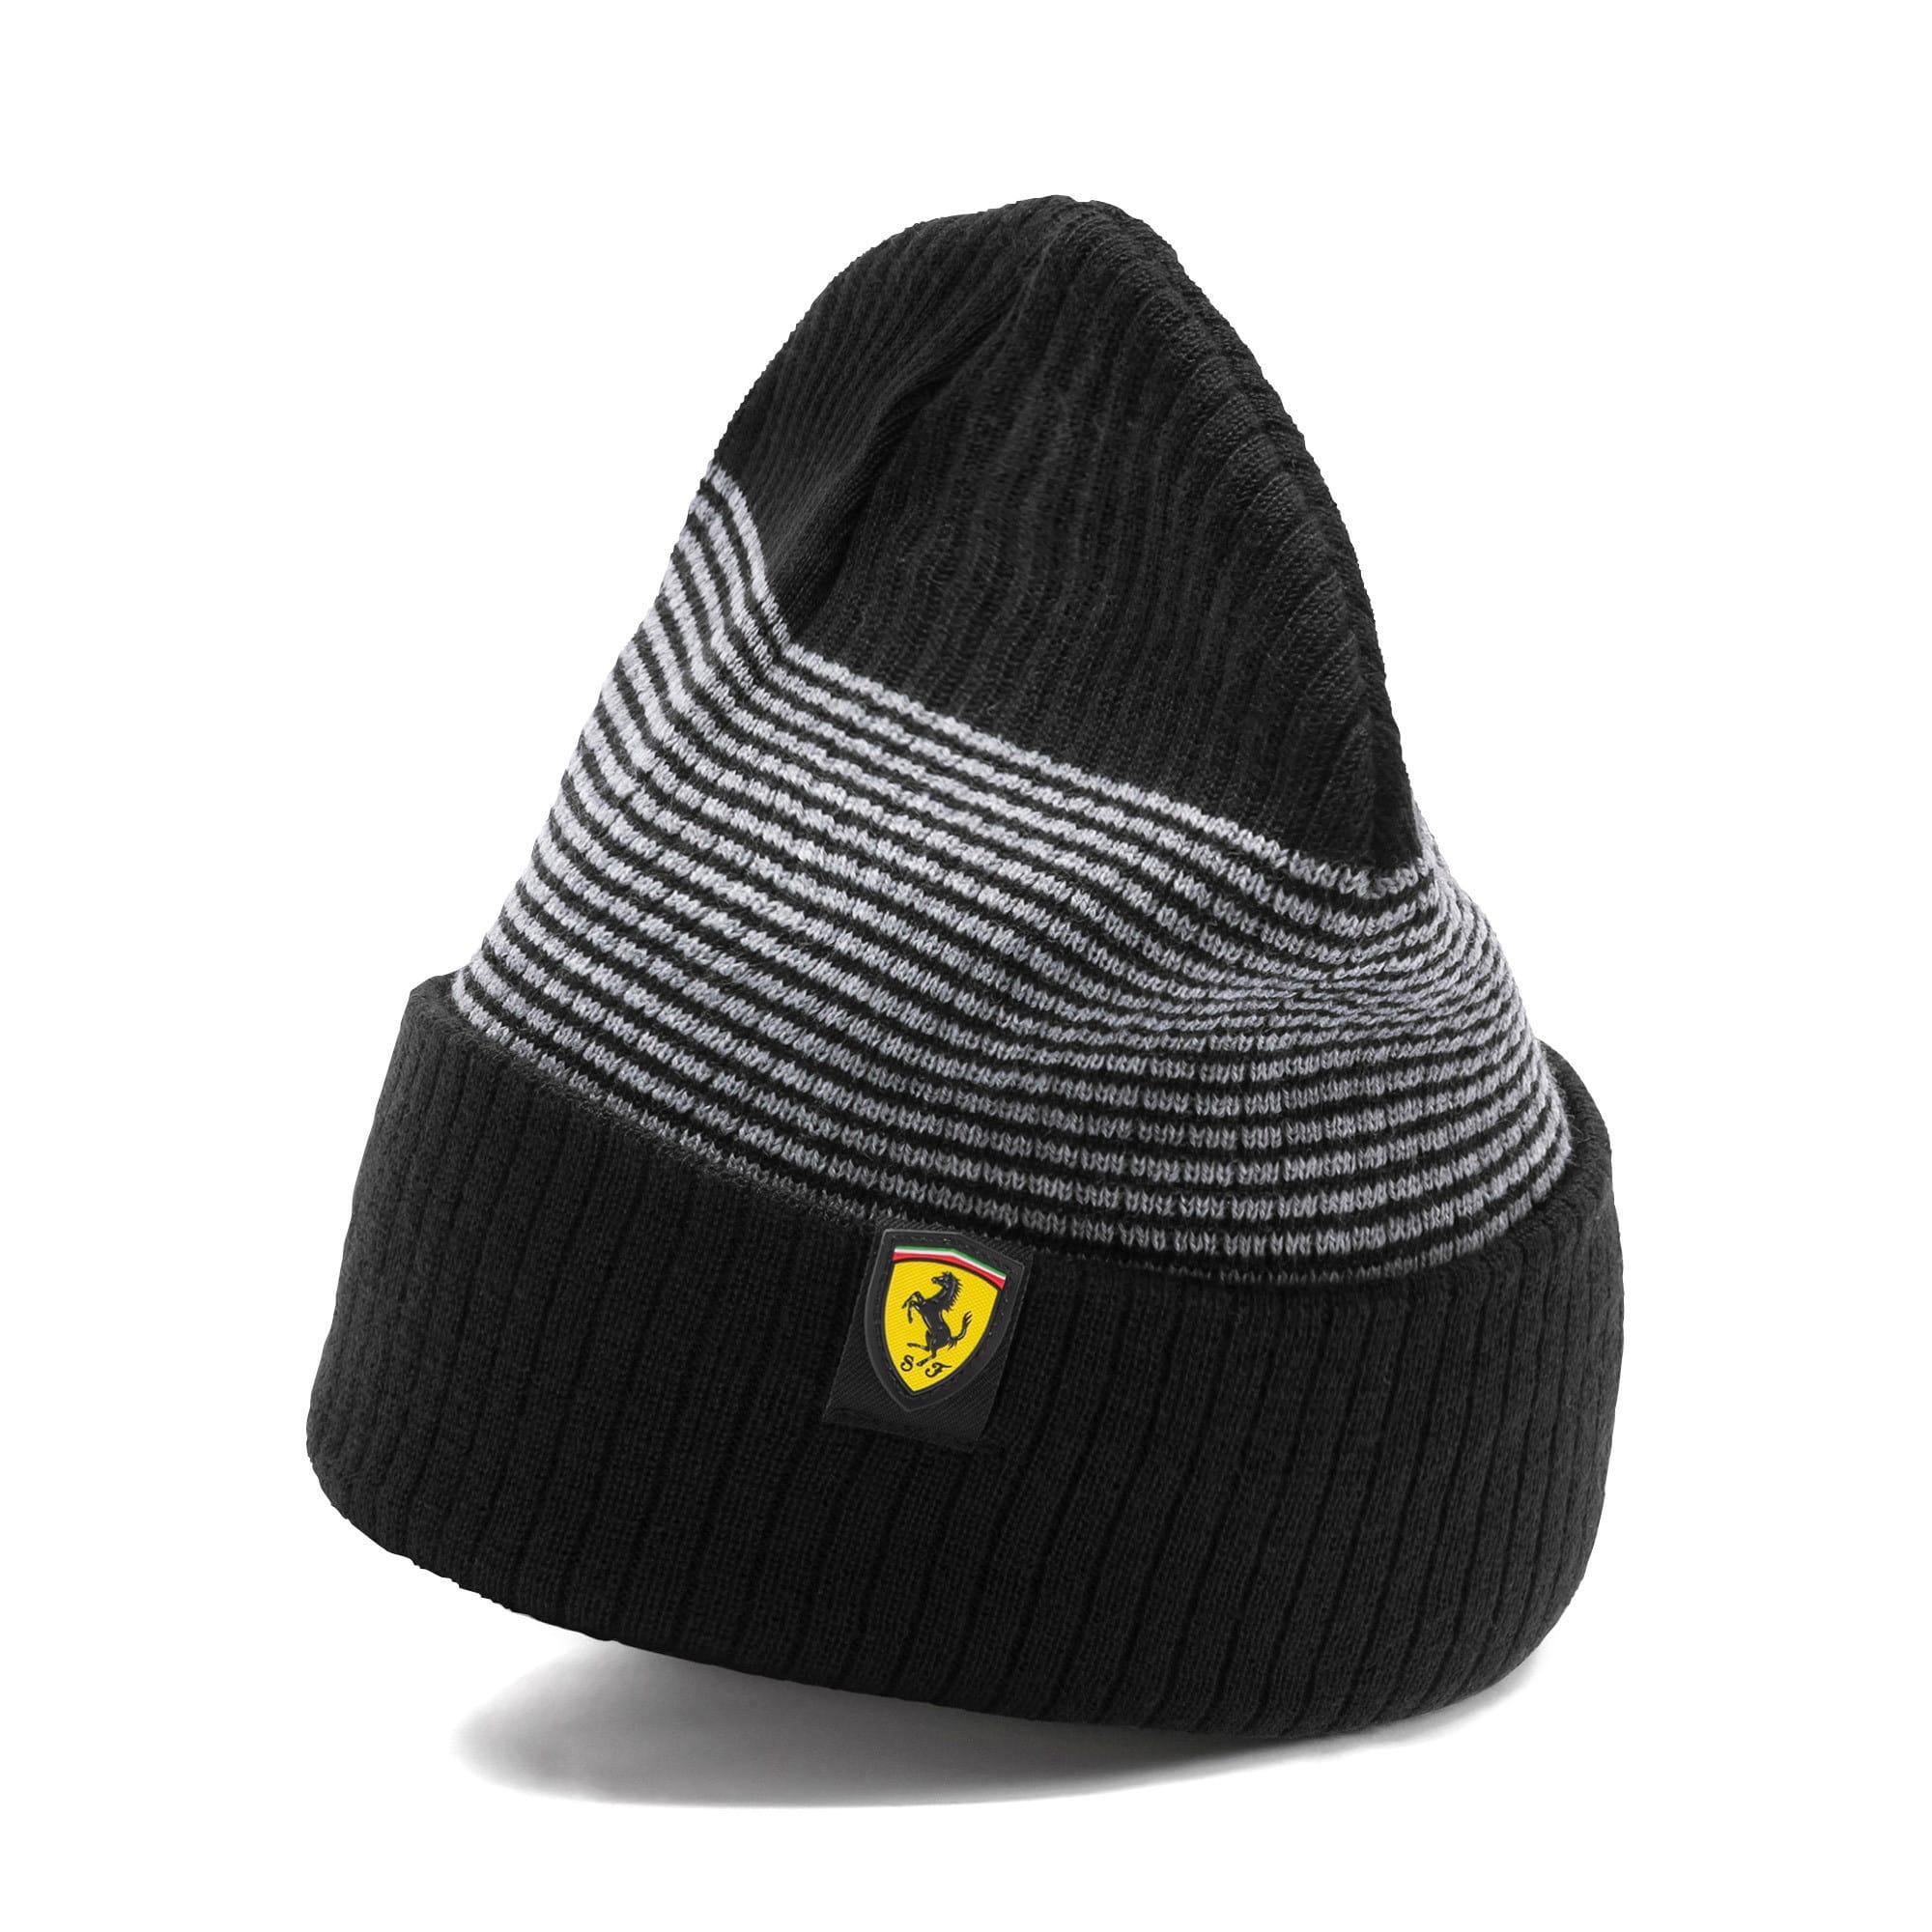 Thumbnail 1 of Ferrari Fanwear Beanie, Puma Black, medium